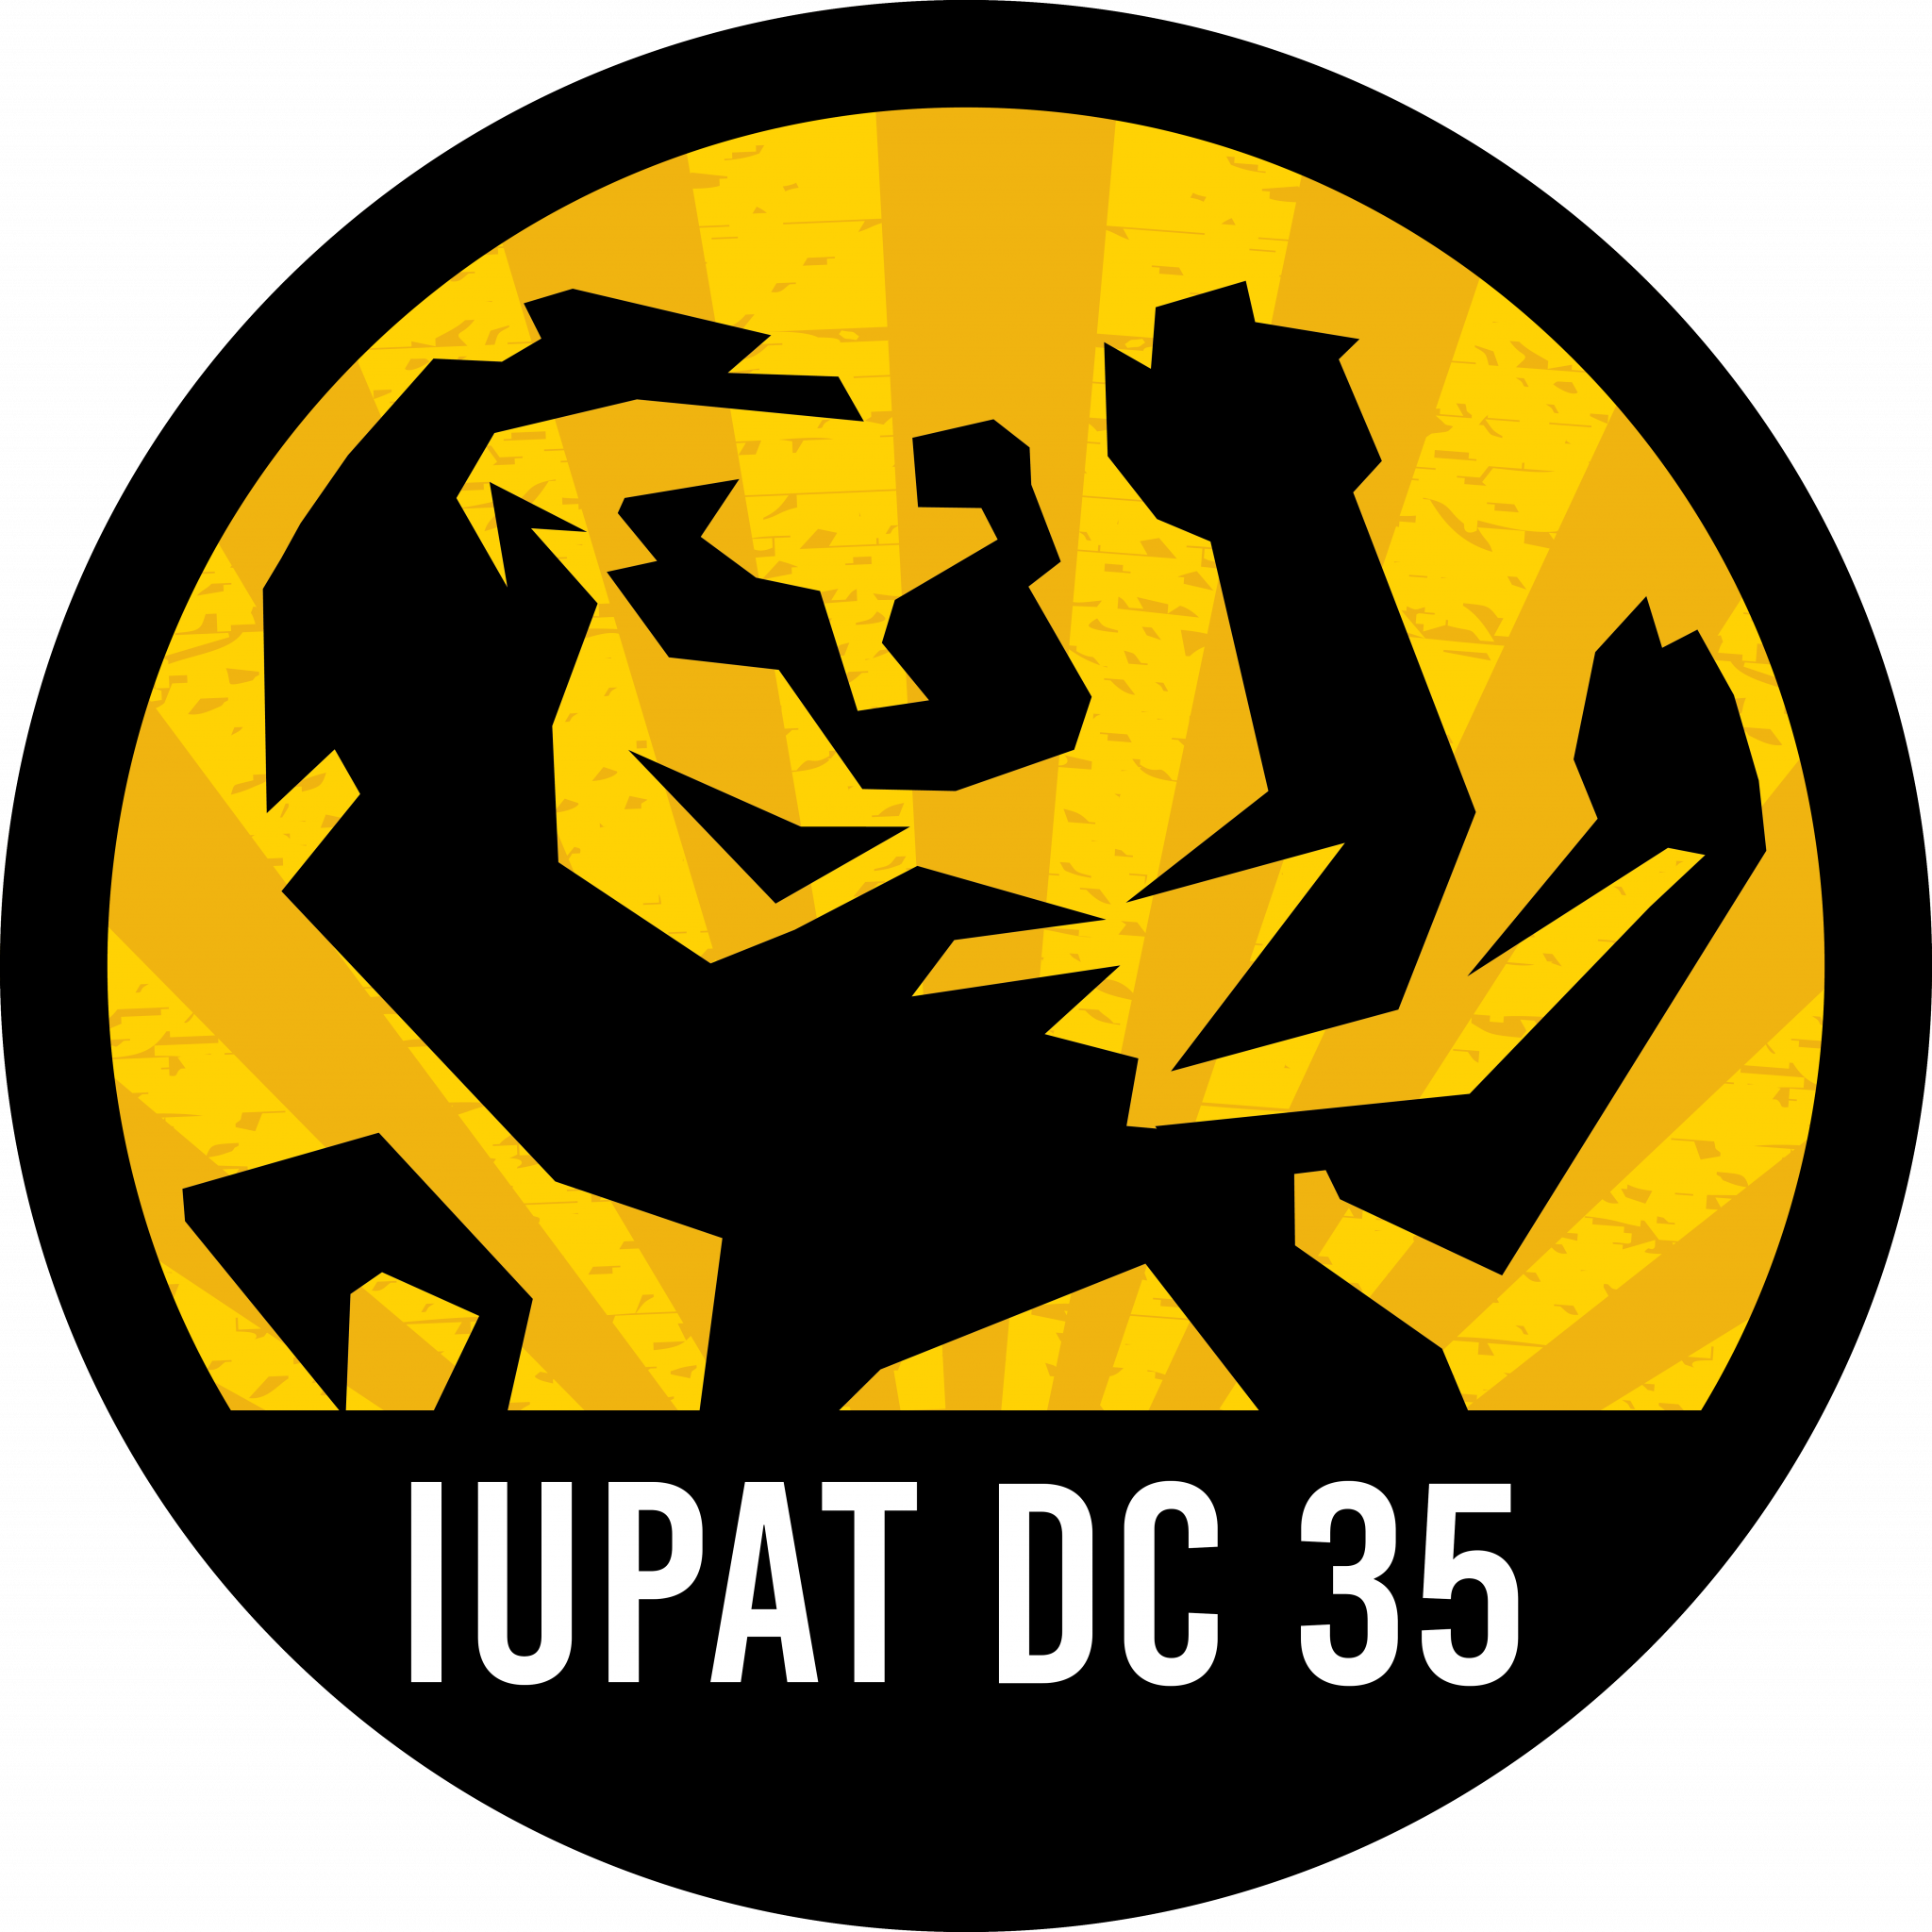 iupatdc35